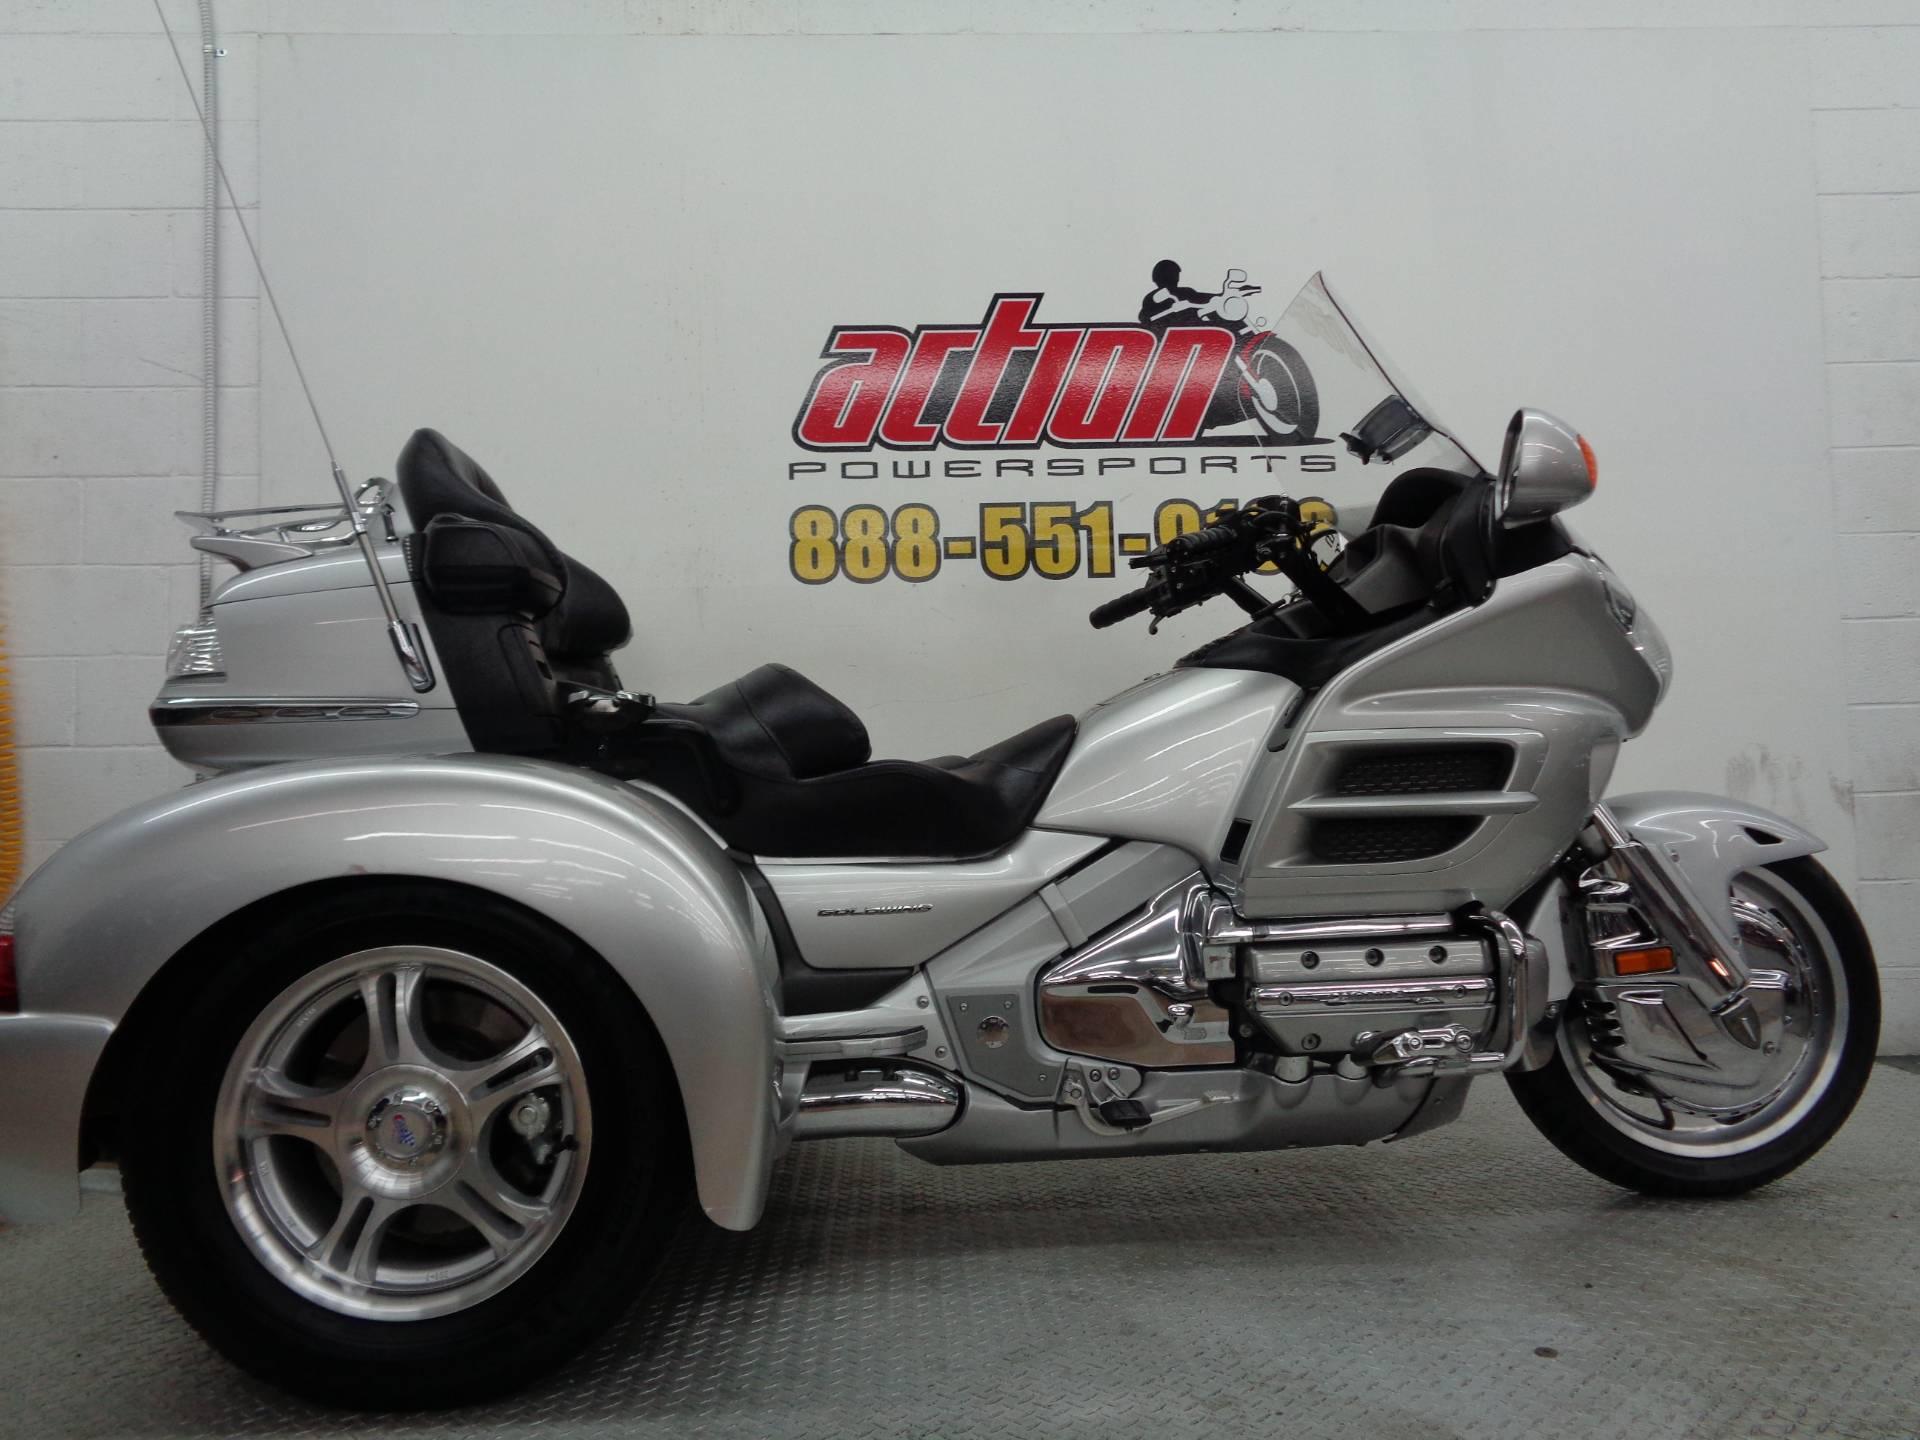 2007 Honda Gold Wing Trike In Tulsa, Oklahoma